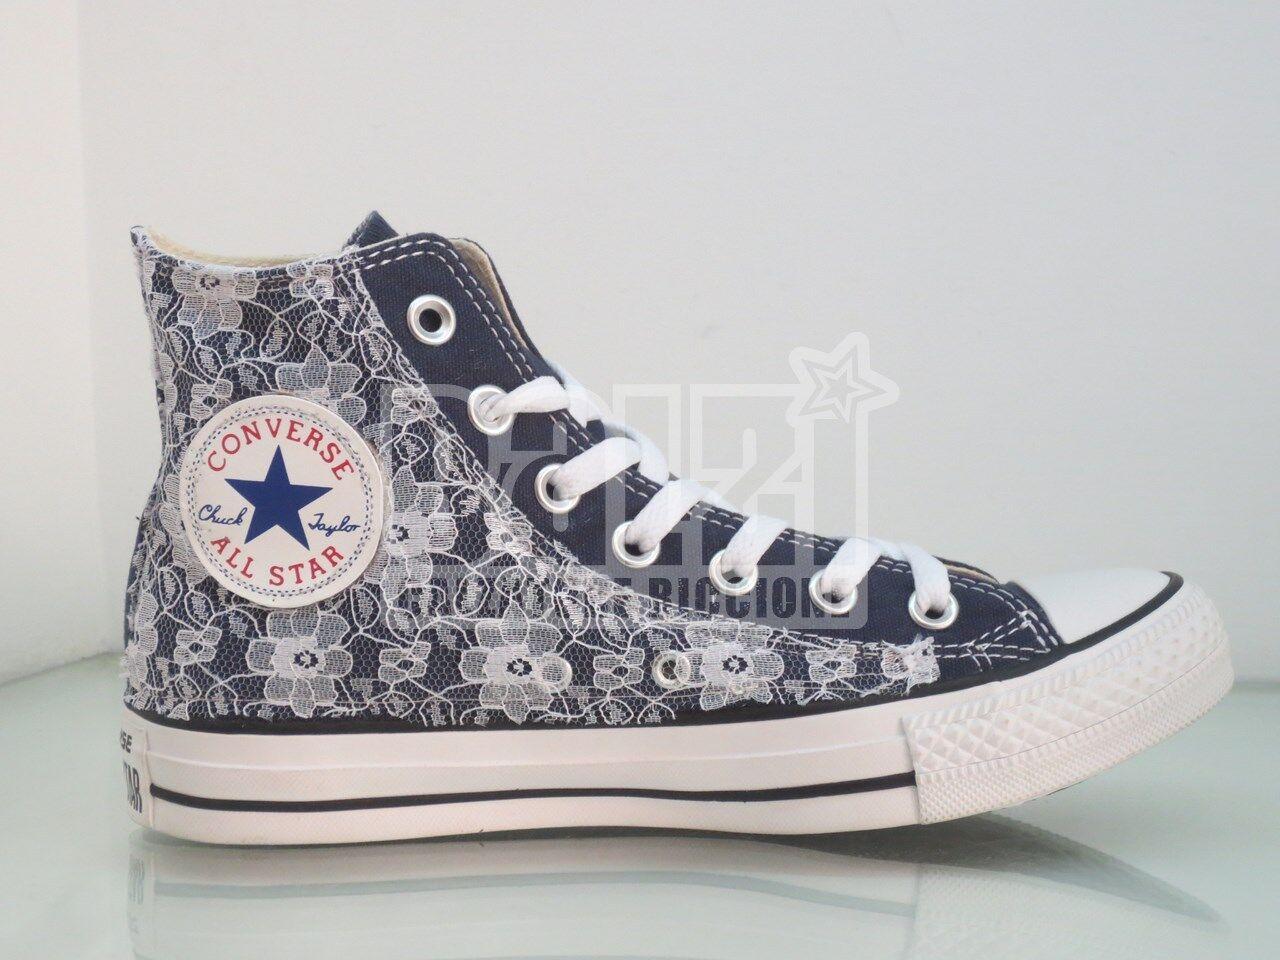 Converse blu all star pizzo navy blu Converse artigianali 344077